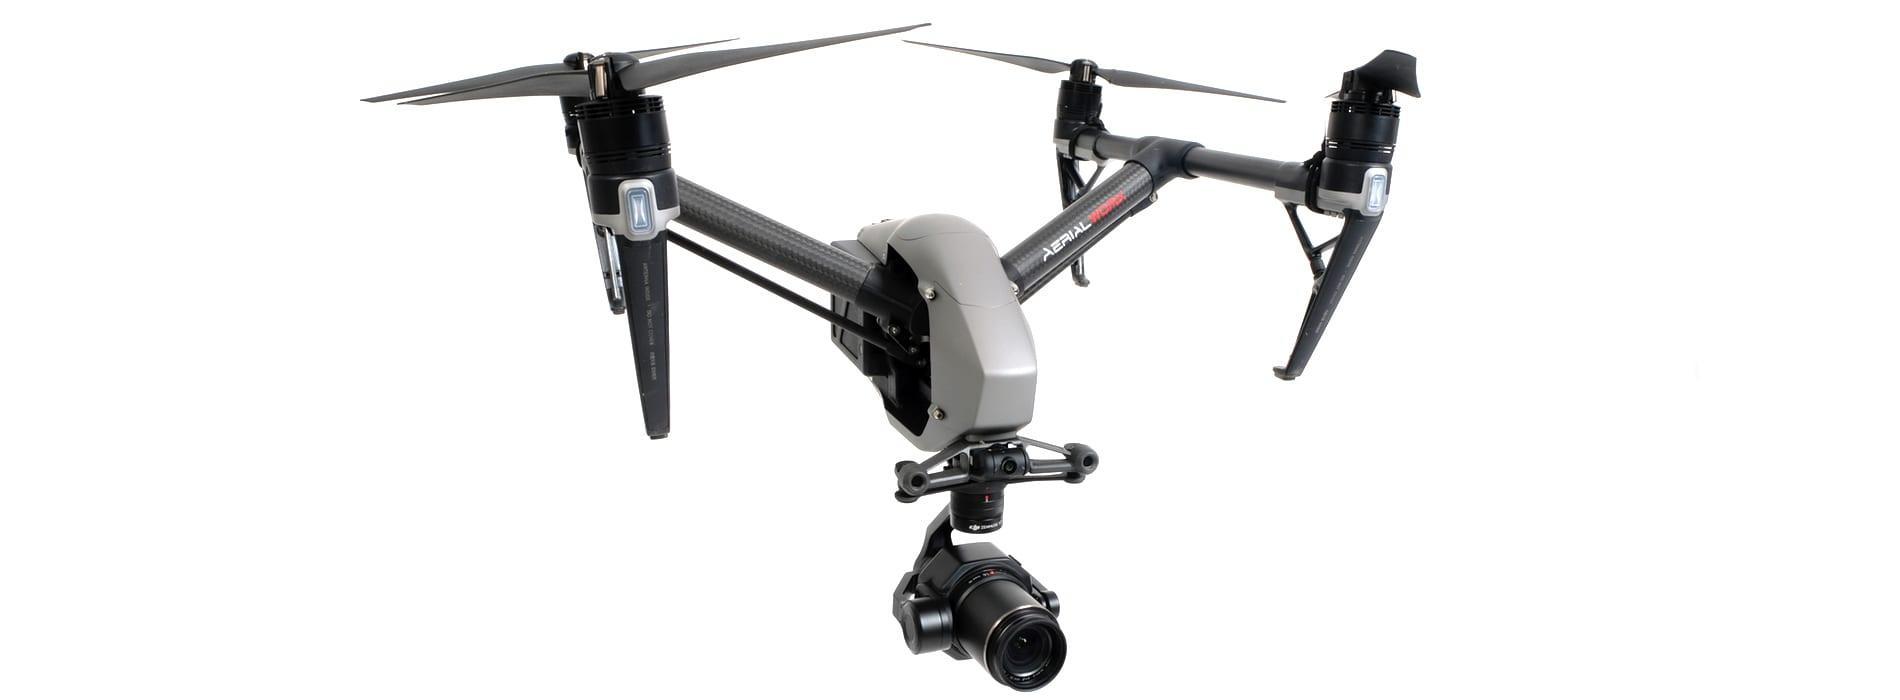 Aerialworx Dji Inspire 2 Quadcopter Drone